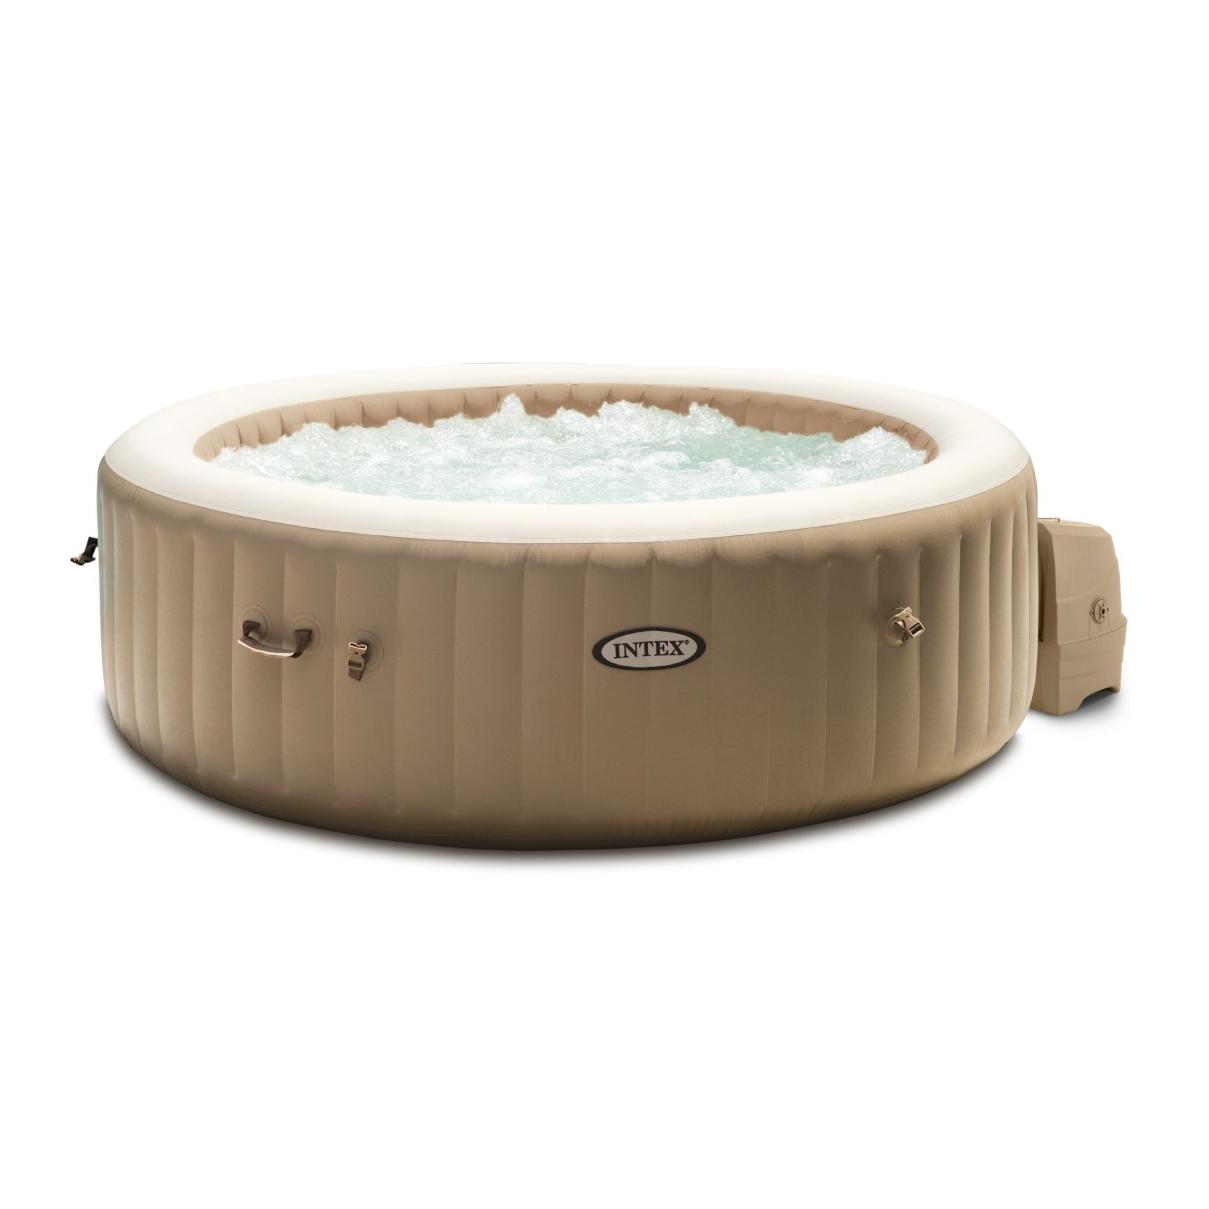 INTEX Pure Spa Vířivý bazén - Bubble HWS béžový MARIMEX 11400217